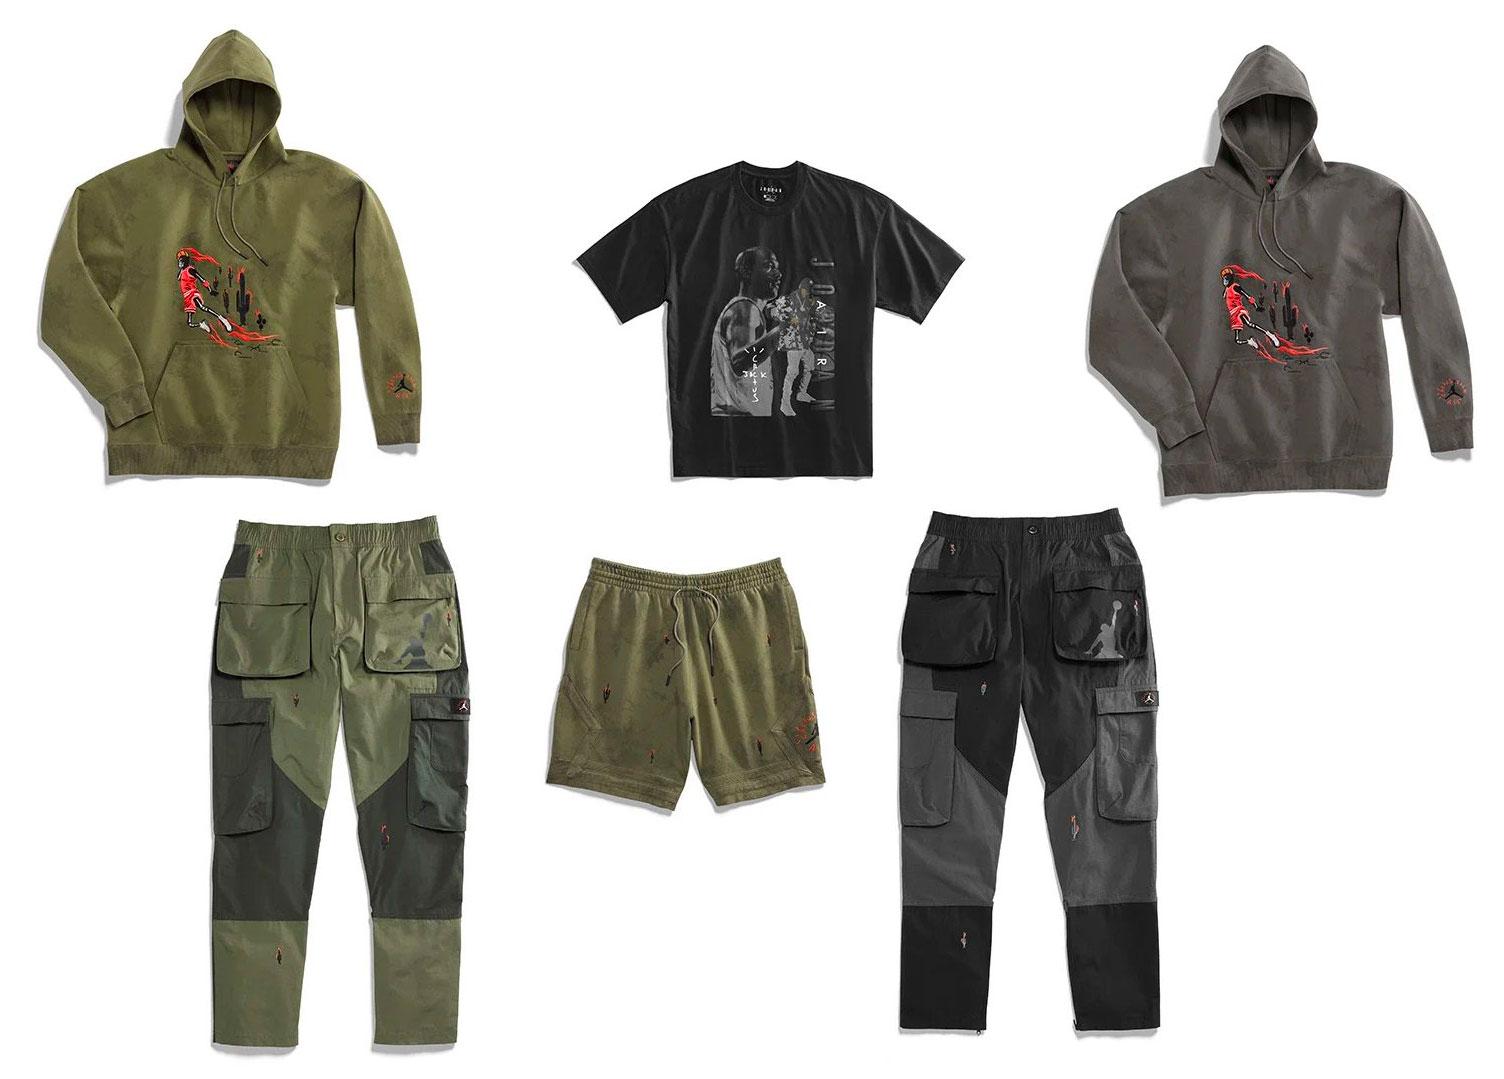 travis-scott-air-jordan-6-clothing-apparel